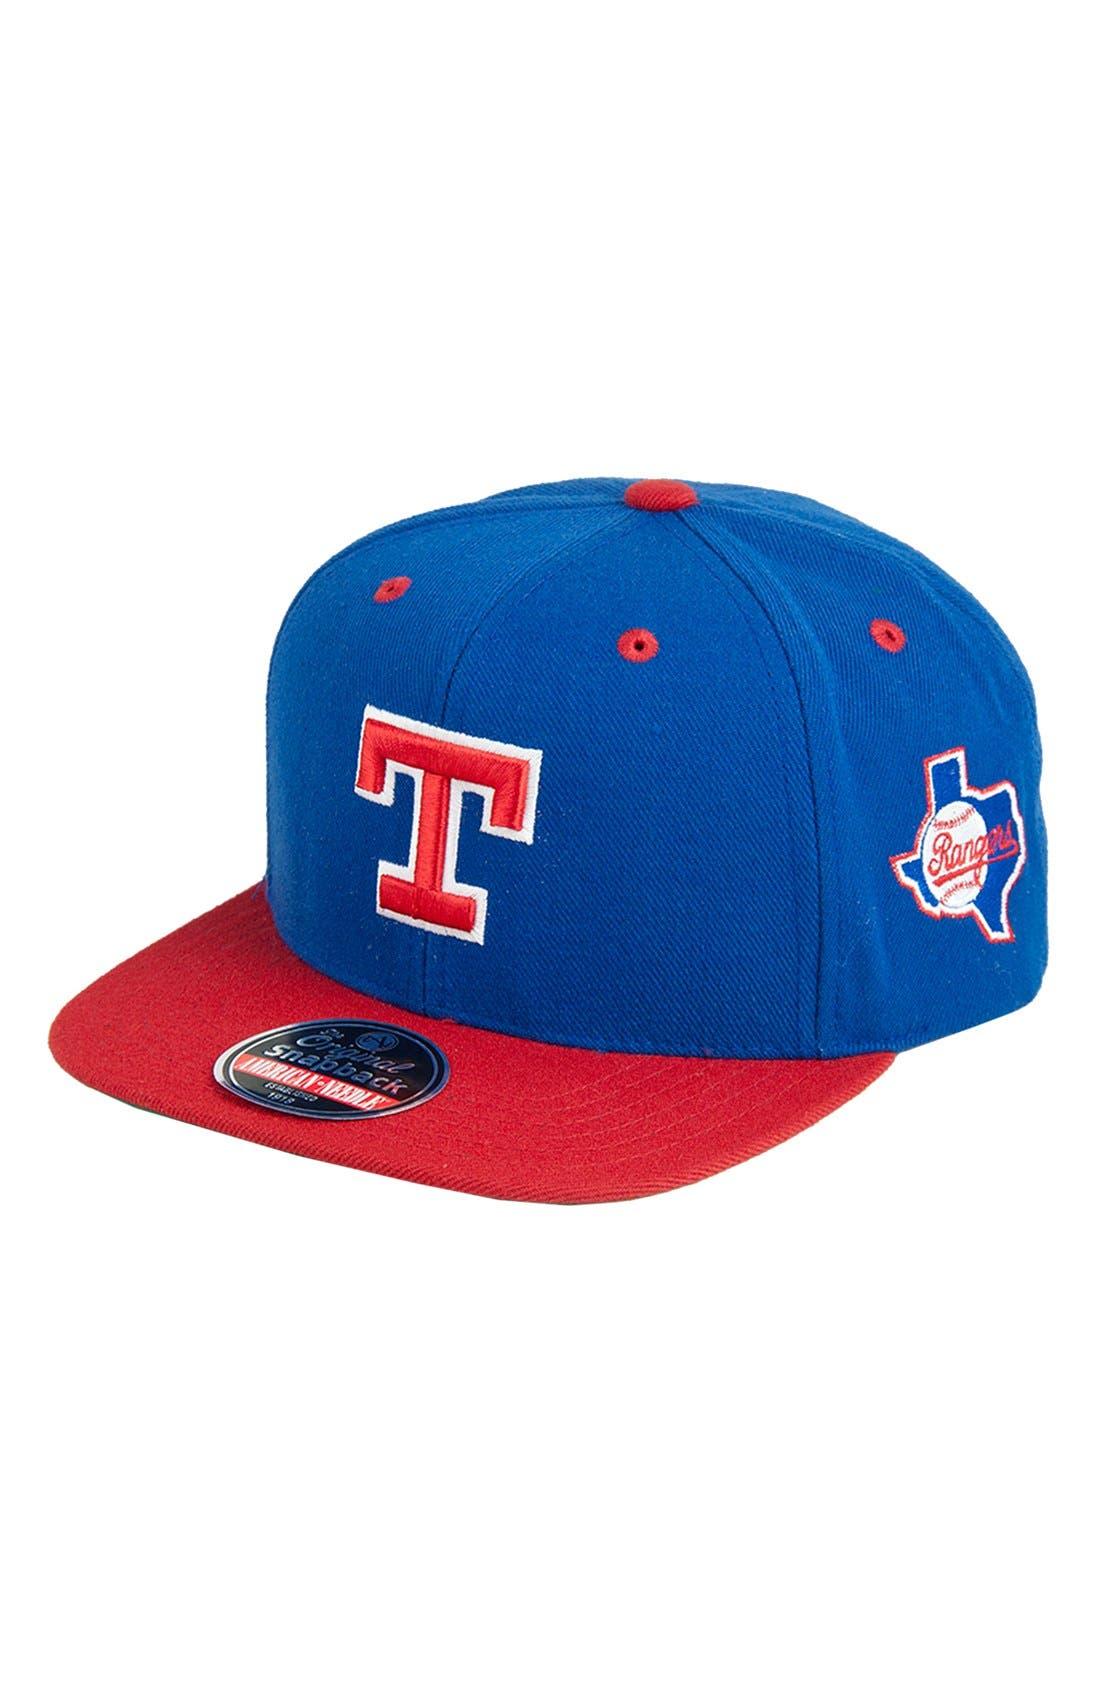 Alternate Image 1 Selected - American Needle 'Texas Rangers - Blockhead' Snapback Baseball Cap